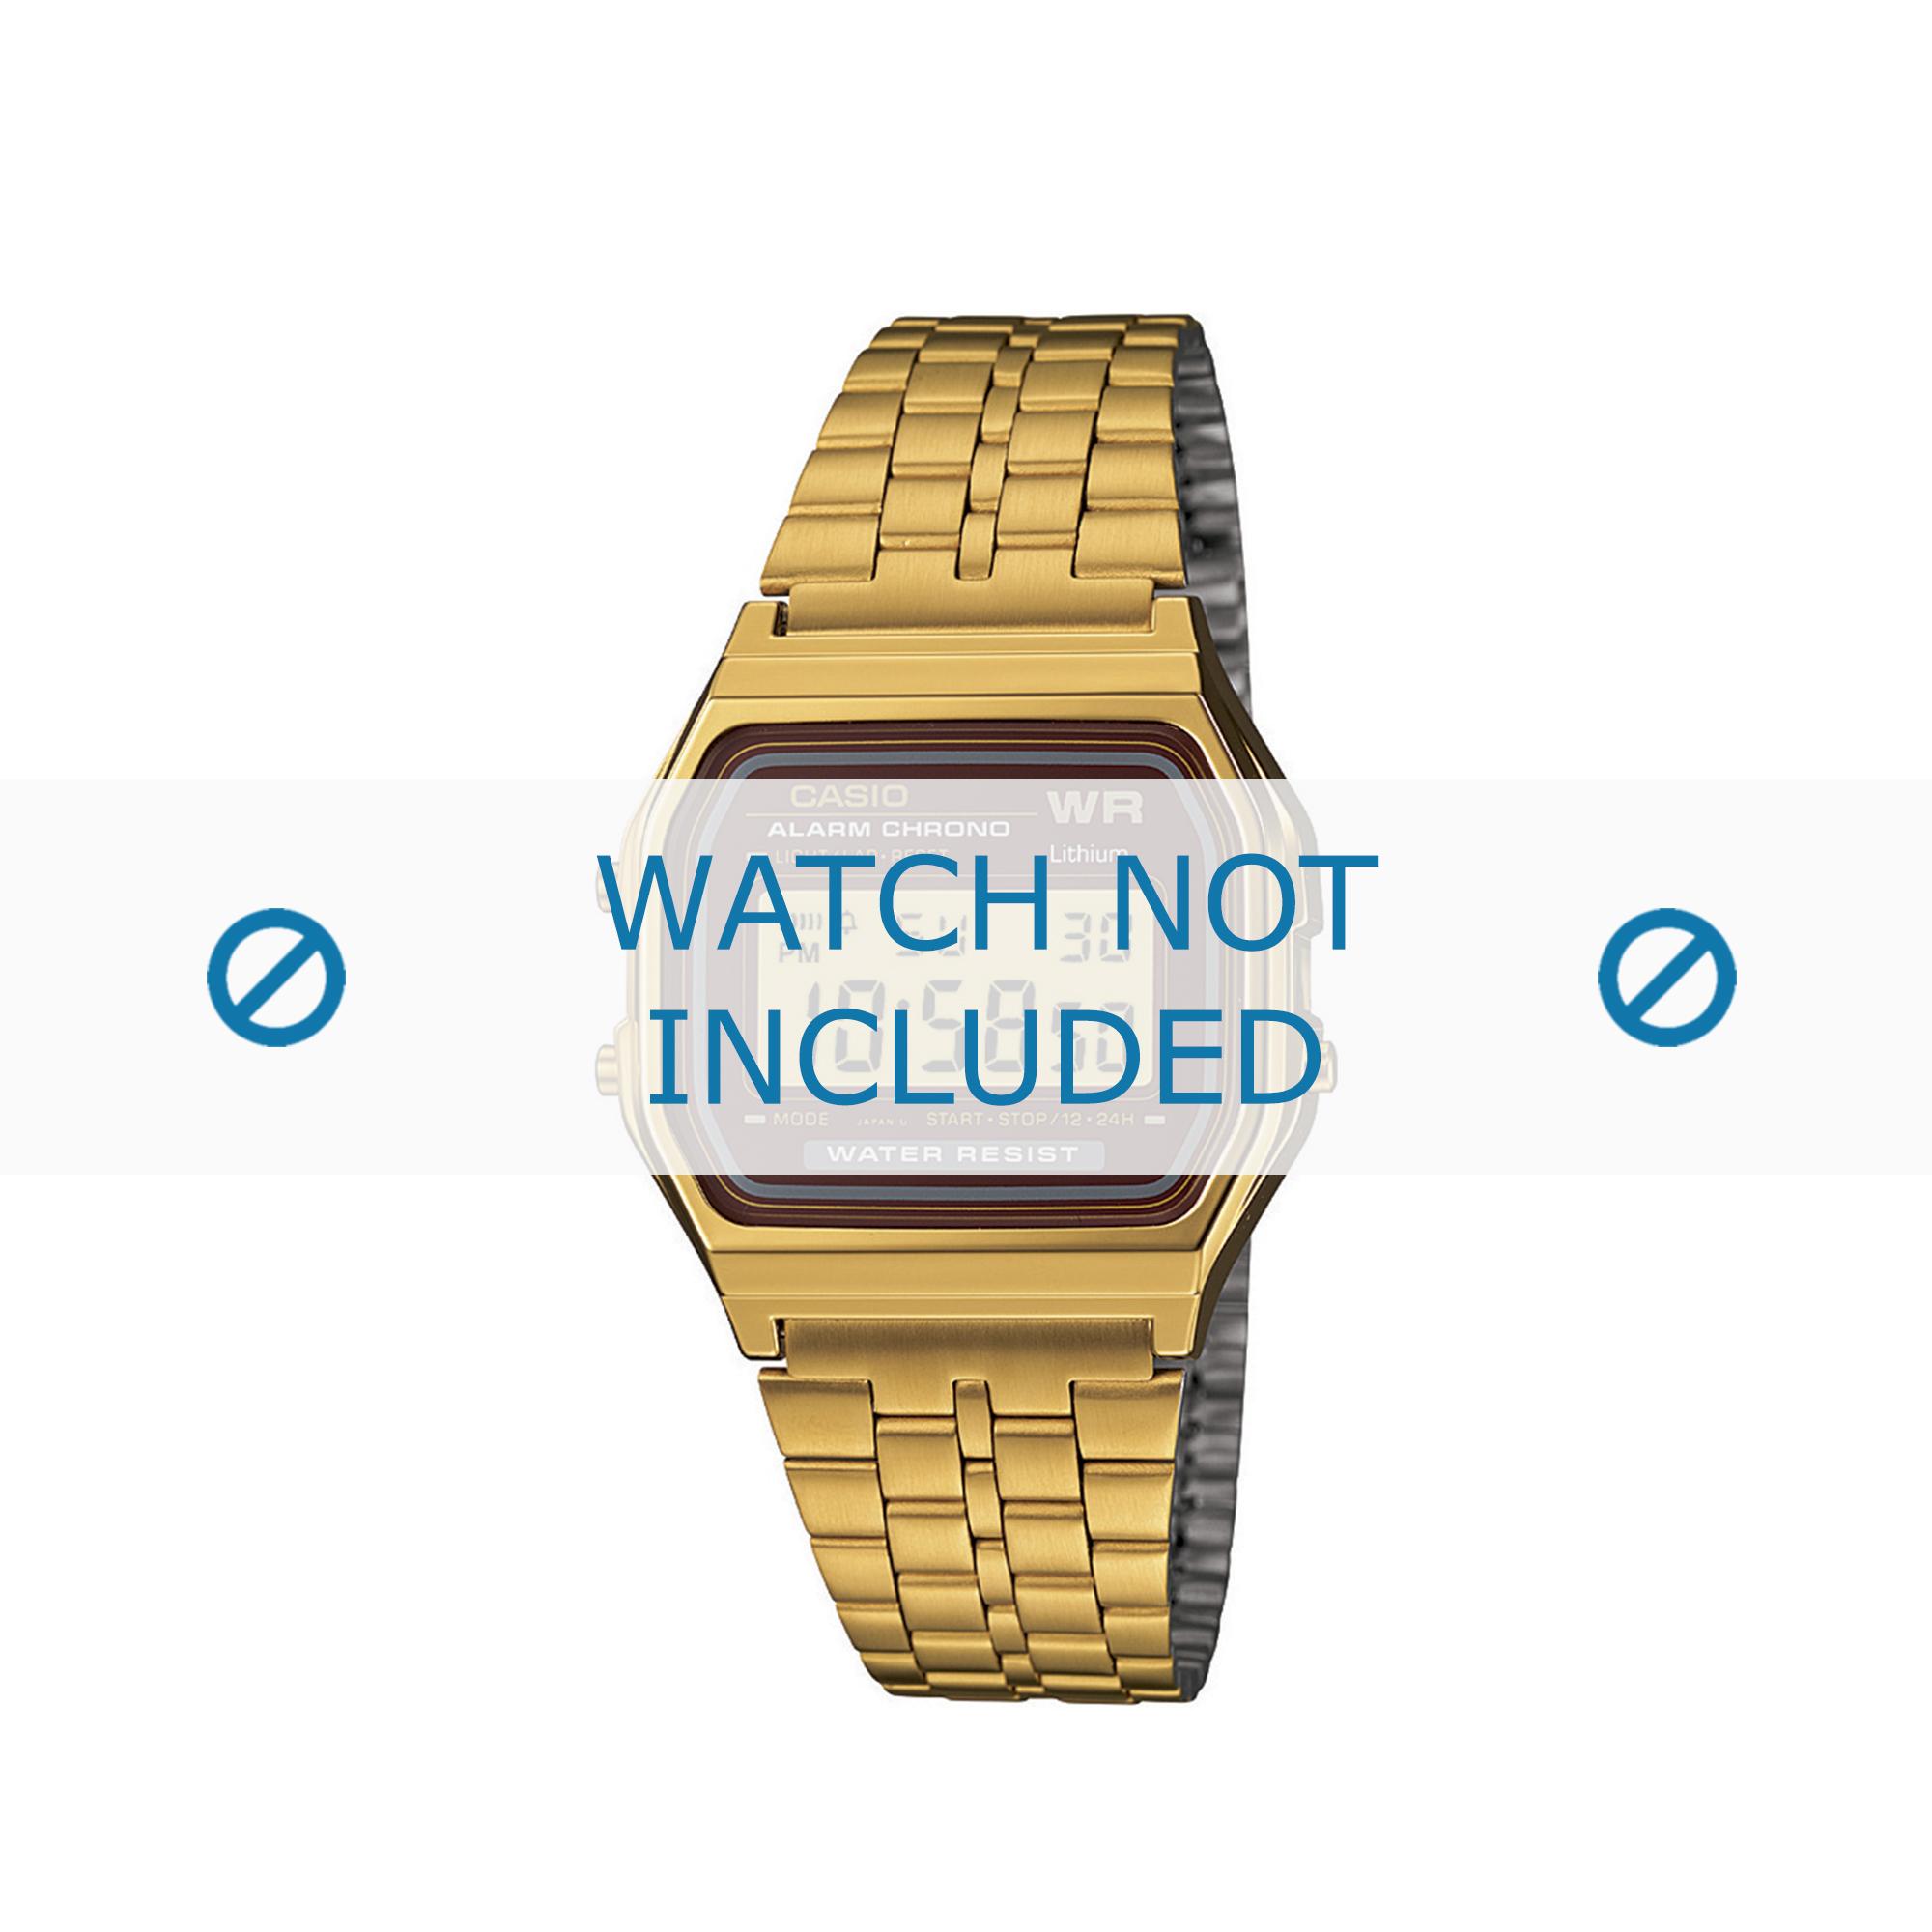 Casio horlogeband A159WGEA-5EF / A159WGEA-5 Staal Goud (Doublé) 18mm